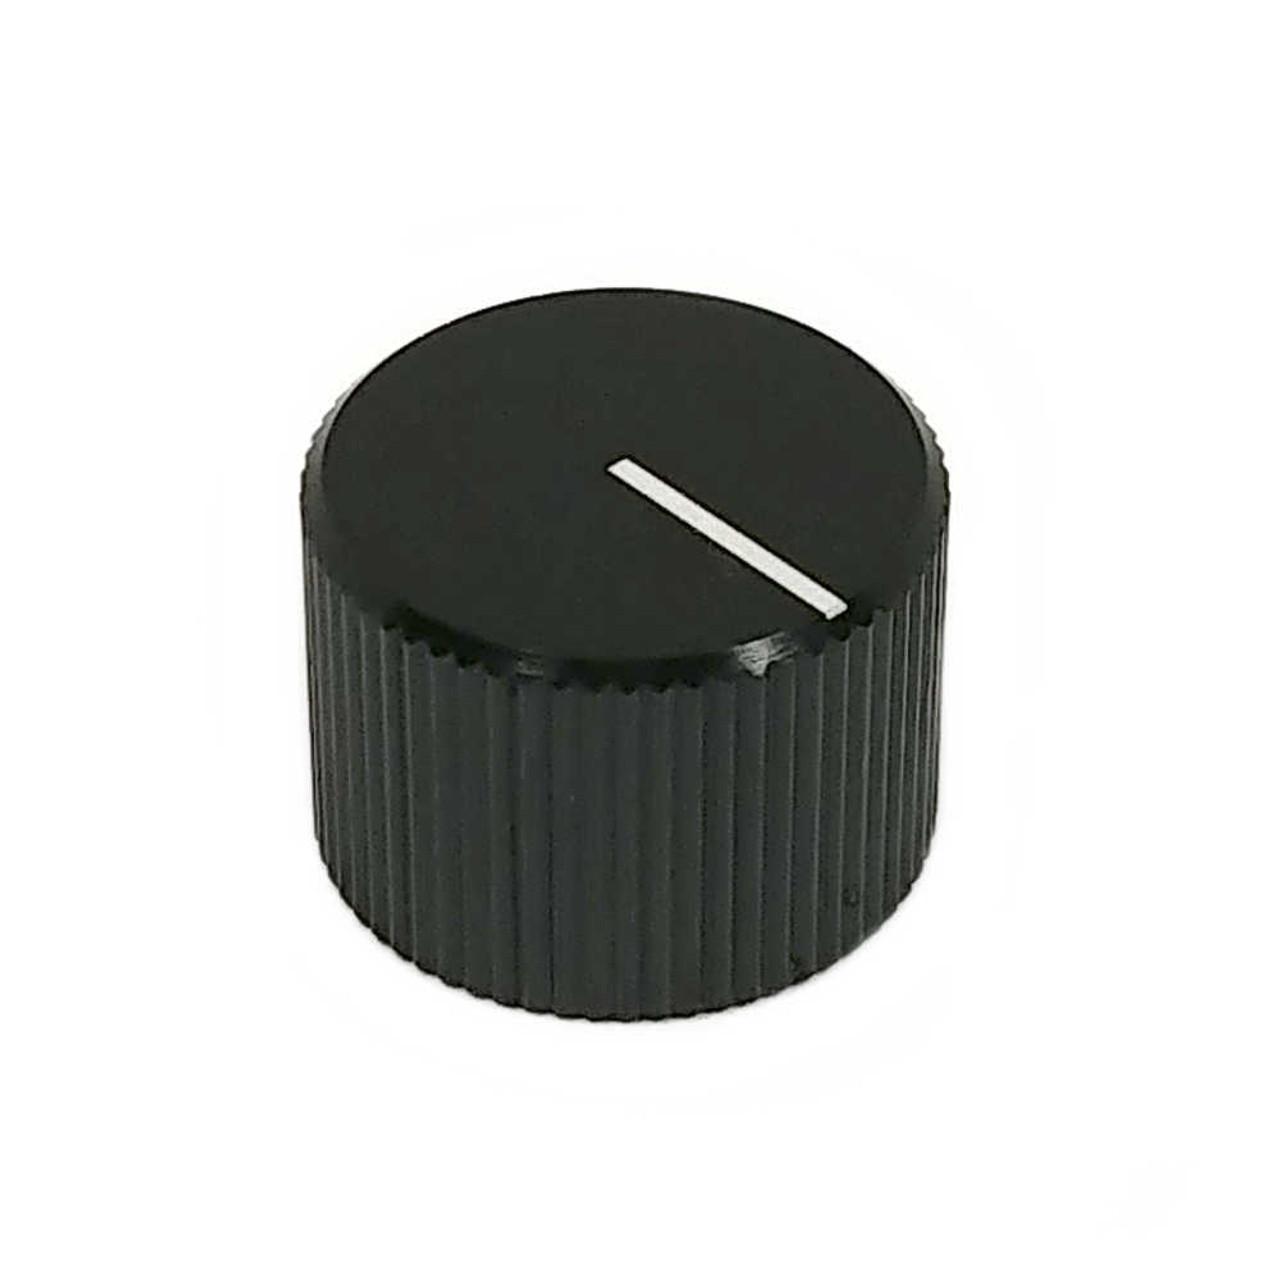 Anodized Aluminum Knob - Black